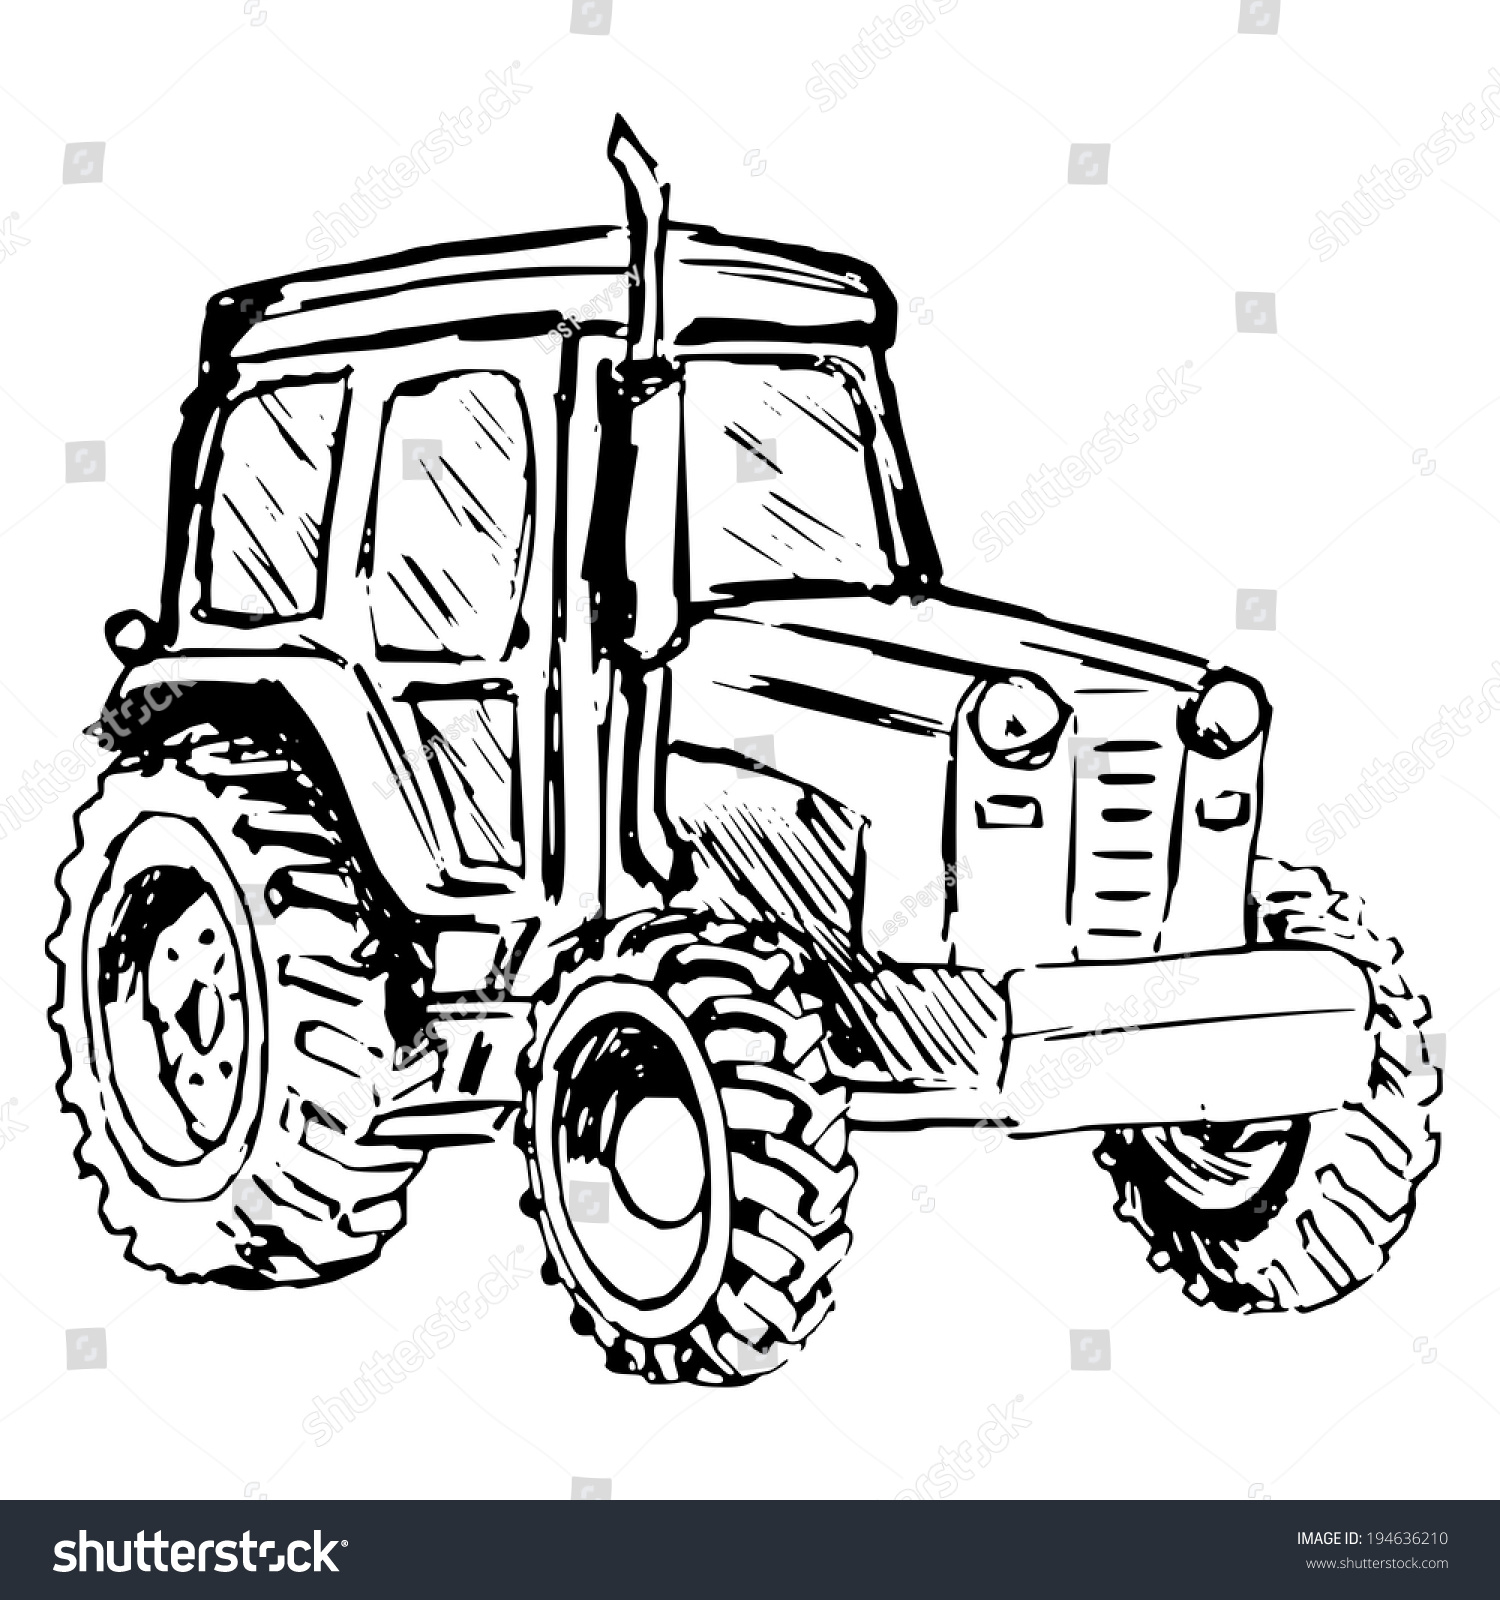 Vintage Tractor Cartoon : Hand drawn cartoon sketch illustration tractor stock